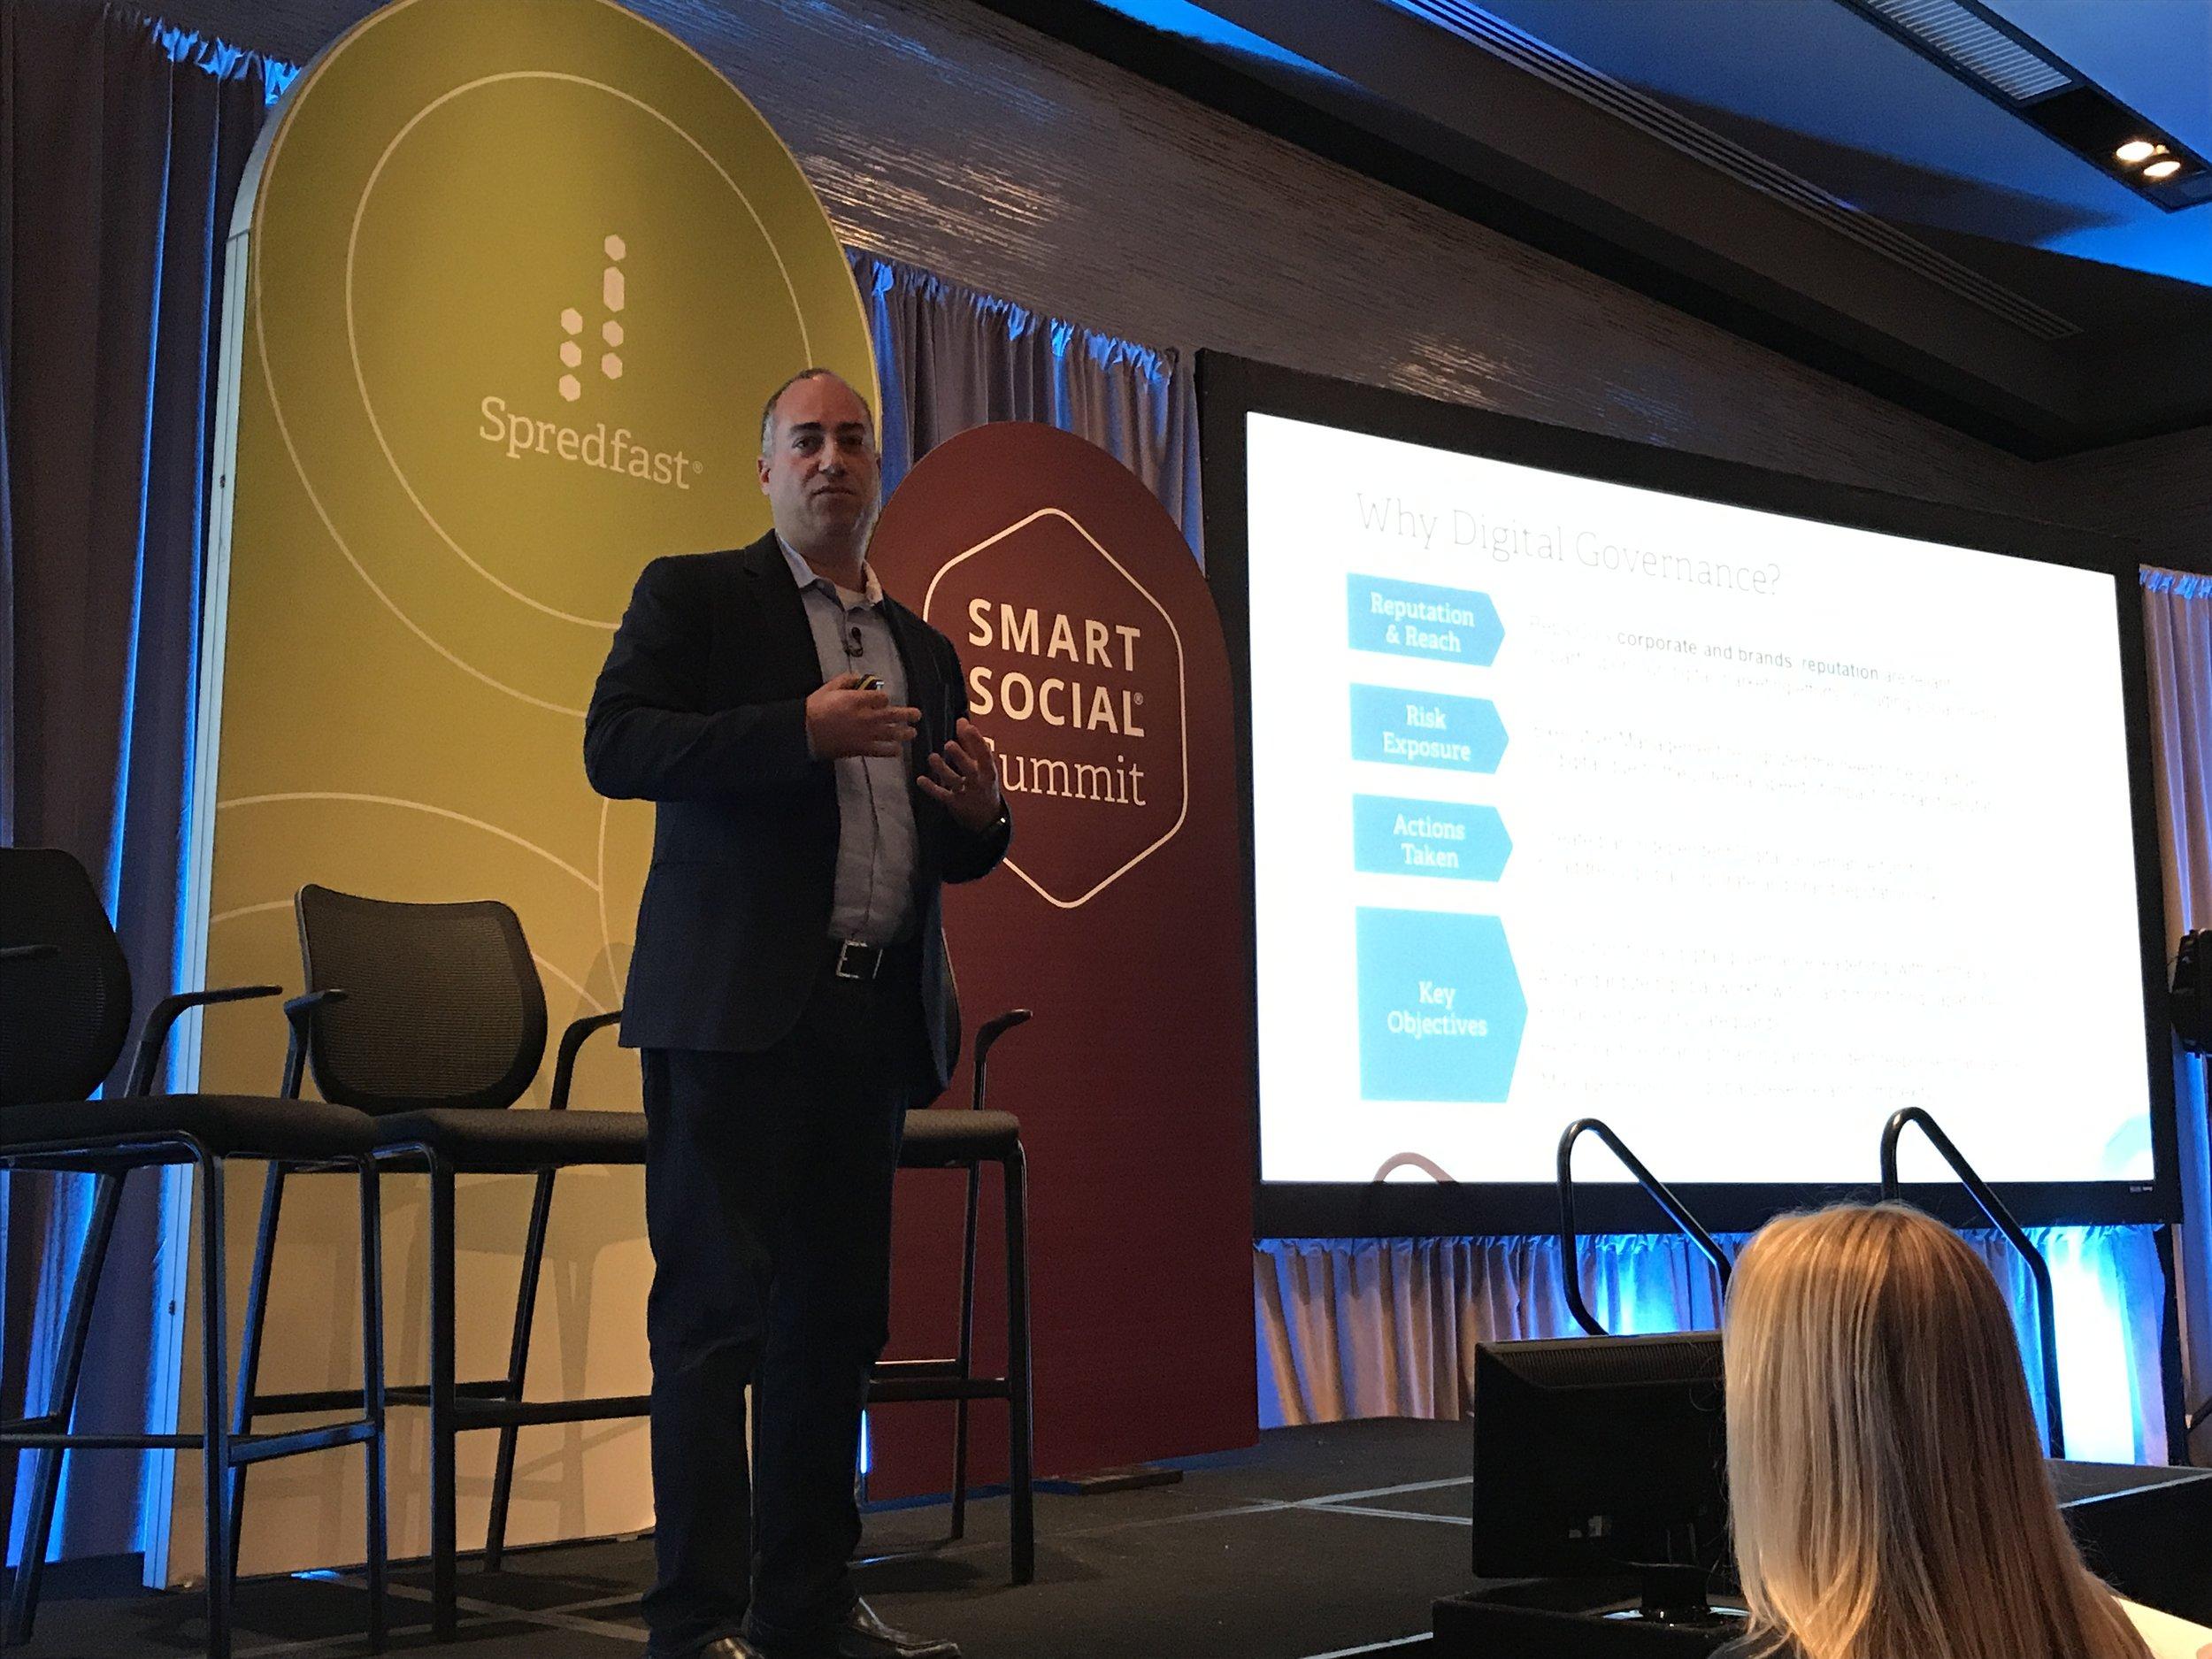 Cory Notrica, Senior Director of Digital Governance, PepsiCo